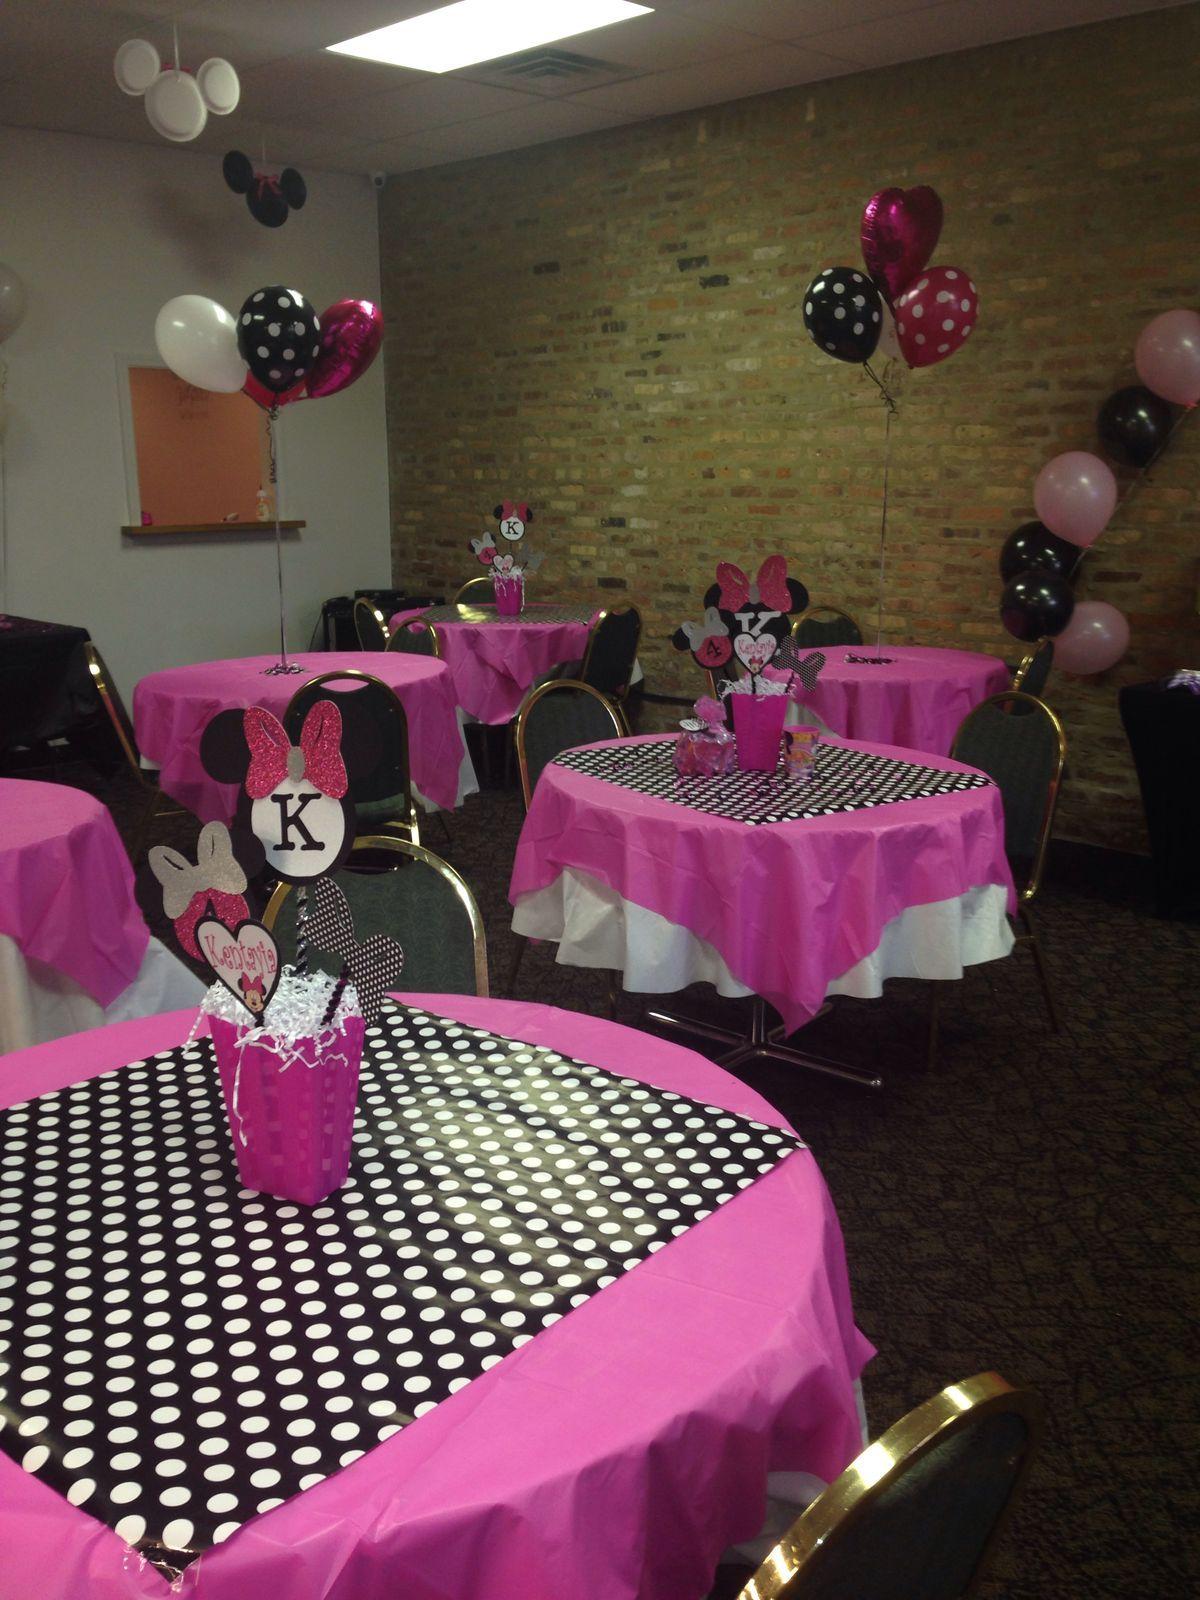 Black And Pink Baby Shower Decorations a2ba029a0bdad52fa23c62f340911f56jpg